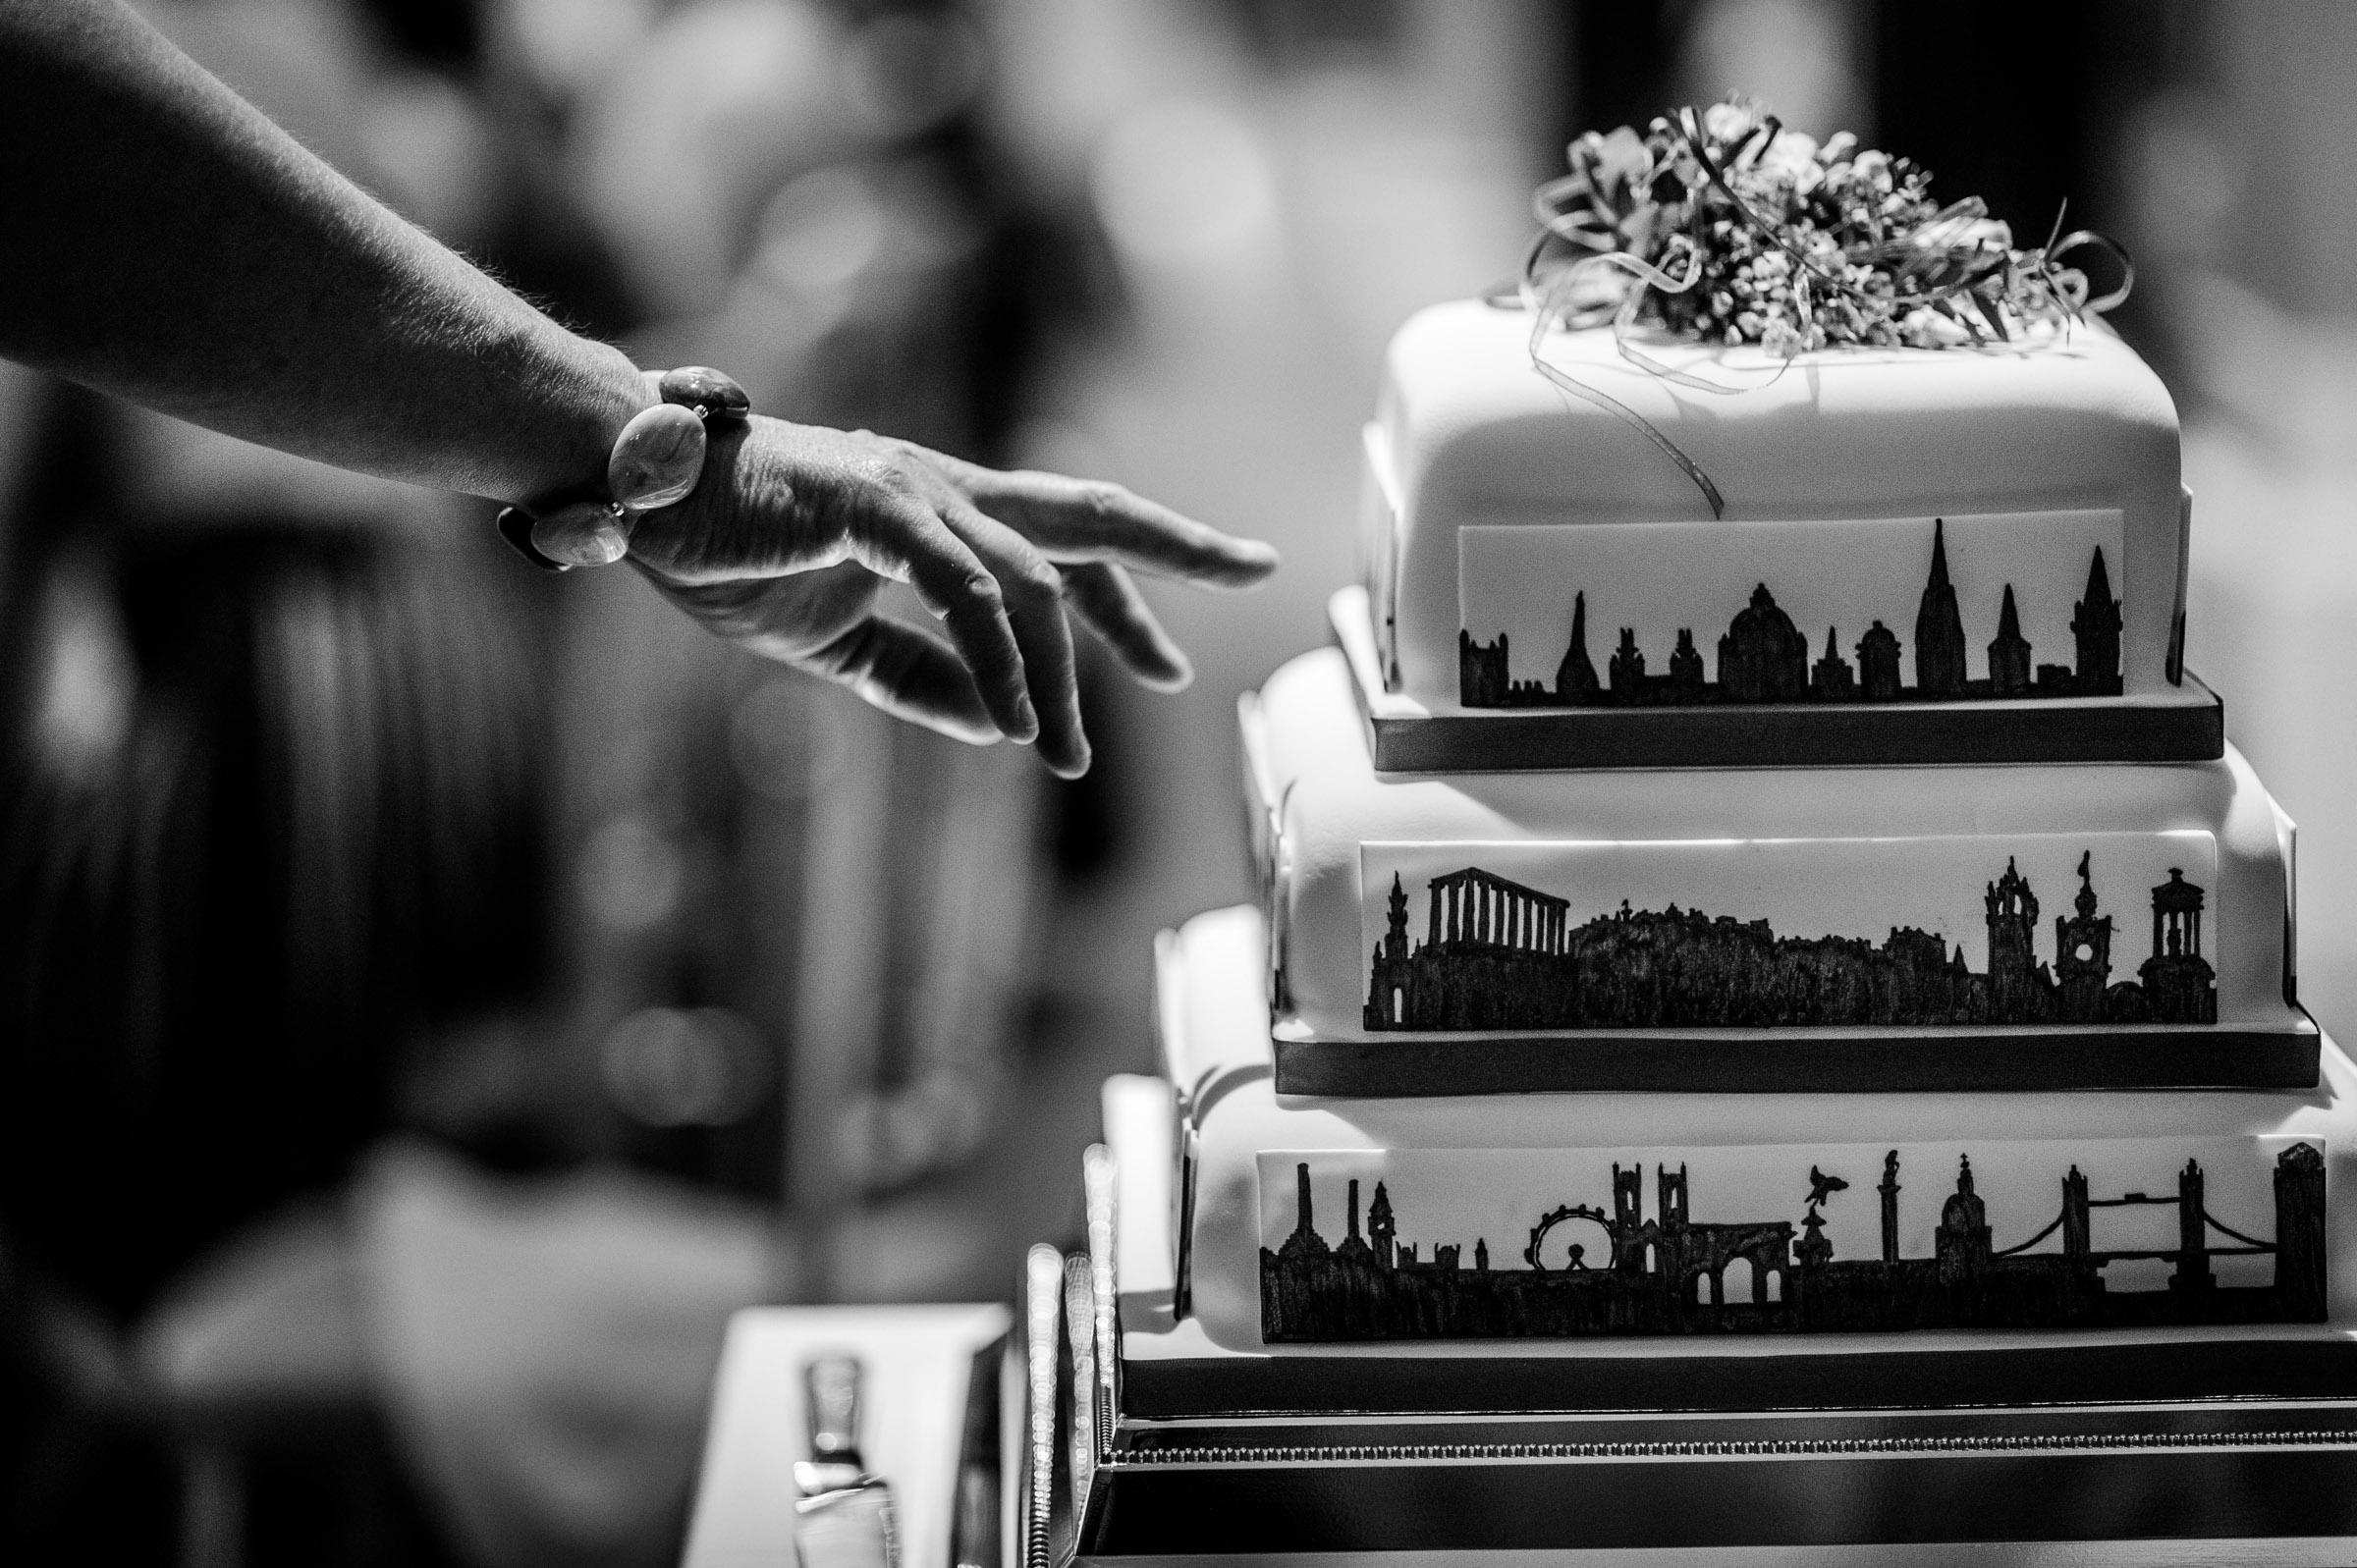 Ashmolean-Museum-Wedding-Pictures-0069.jpg